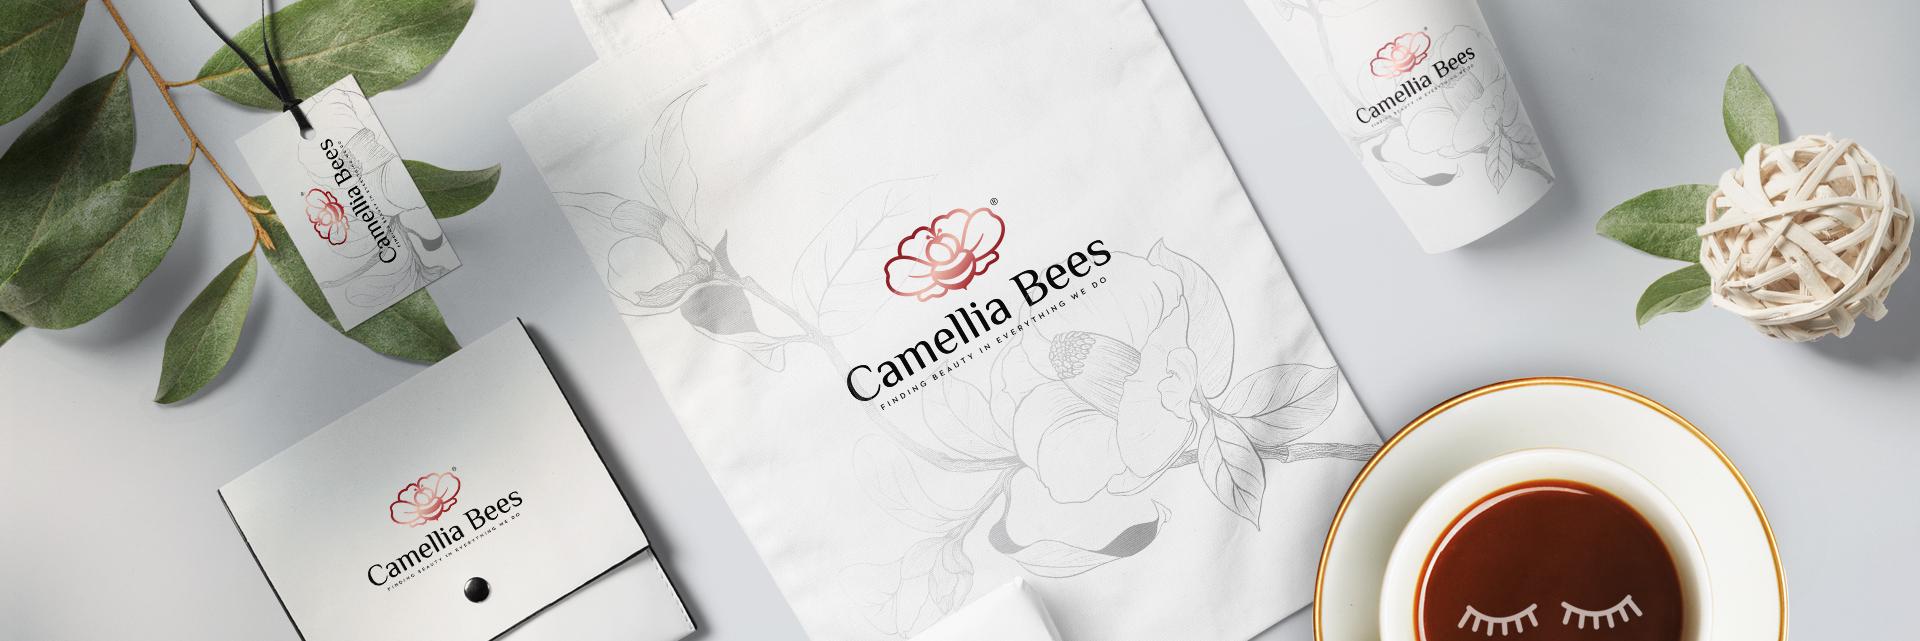 Thiet-ke-logo-camelliabees-slide-1